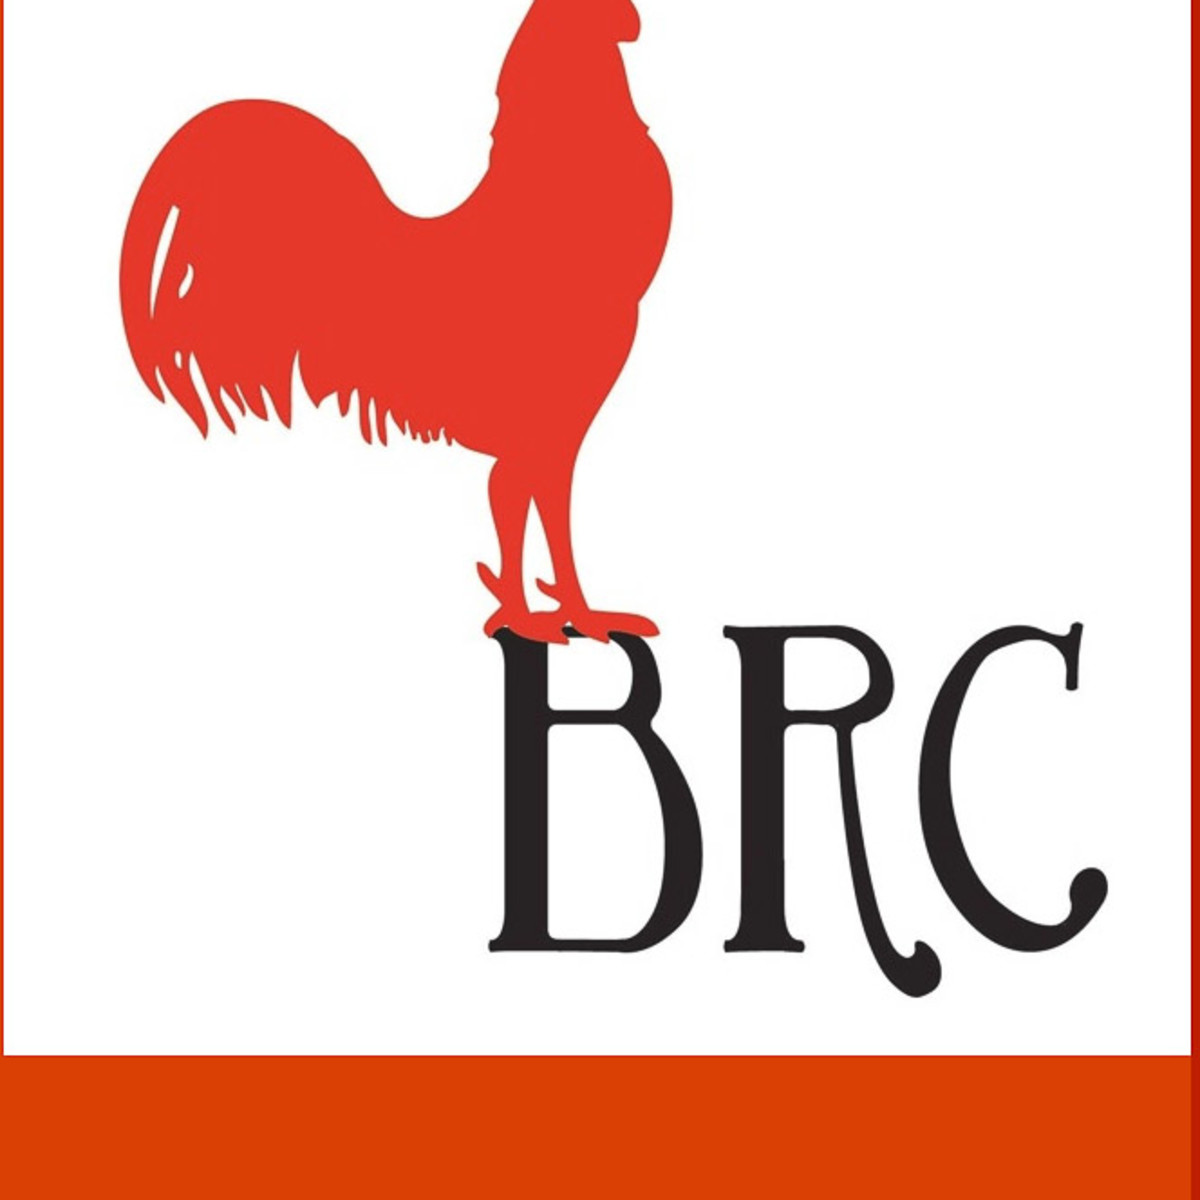 News_Restaurant Roundup_March 2010_BRC Gastropub_logo_THIS